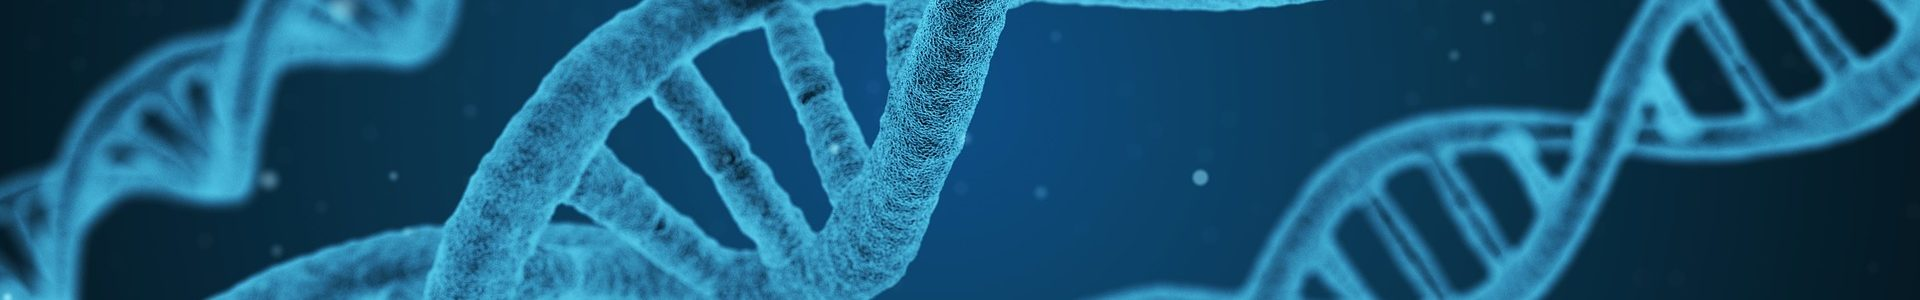 huntington's disease gene path